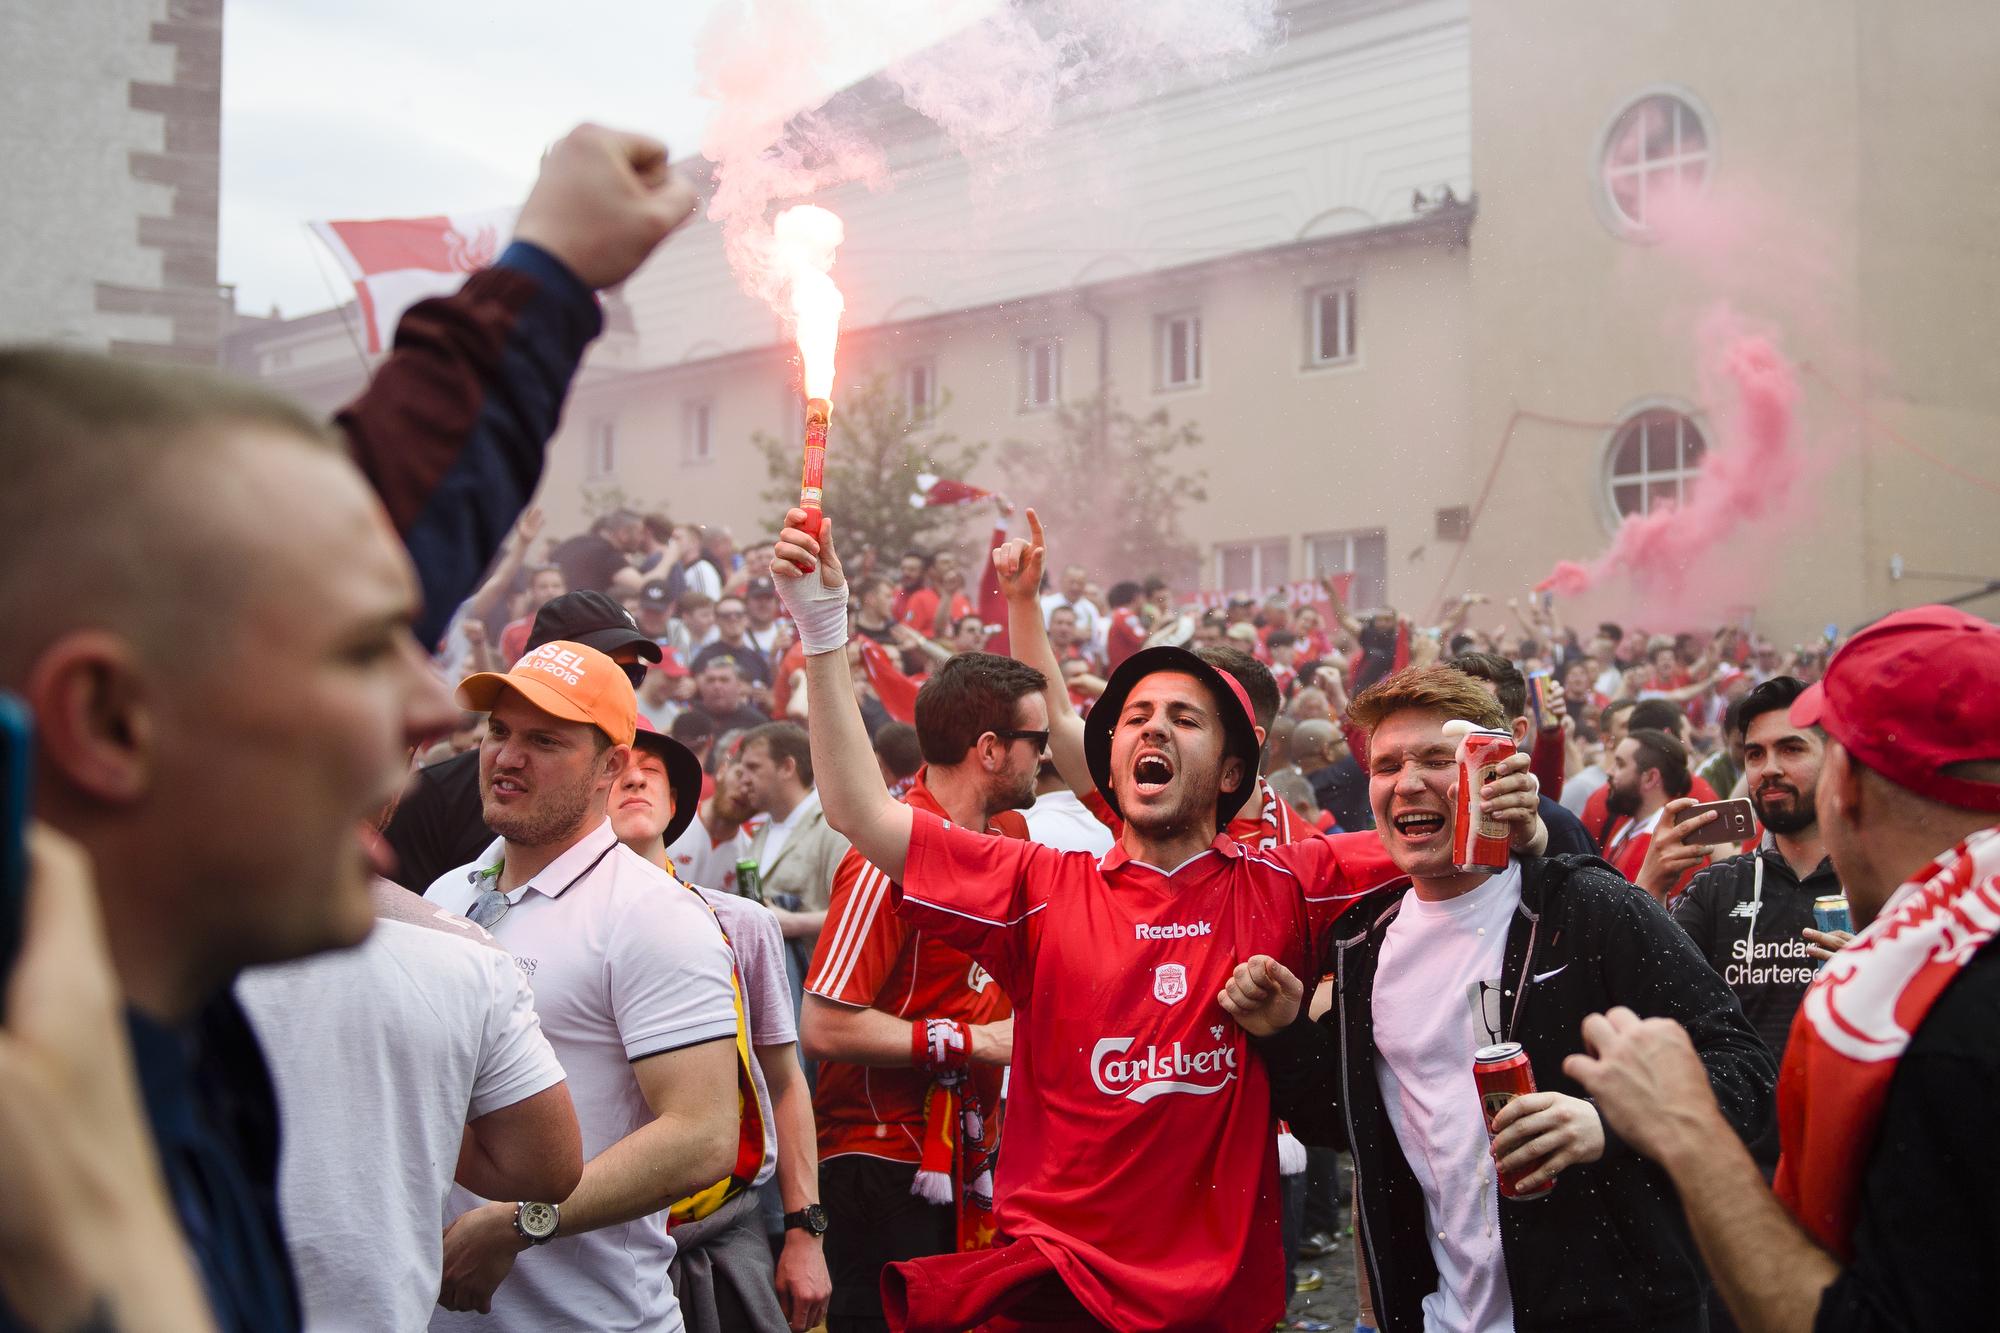 SOCCER EUROPA LEAGUE FINAL LIVERPOOL SEVILLA